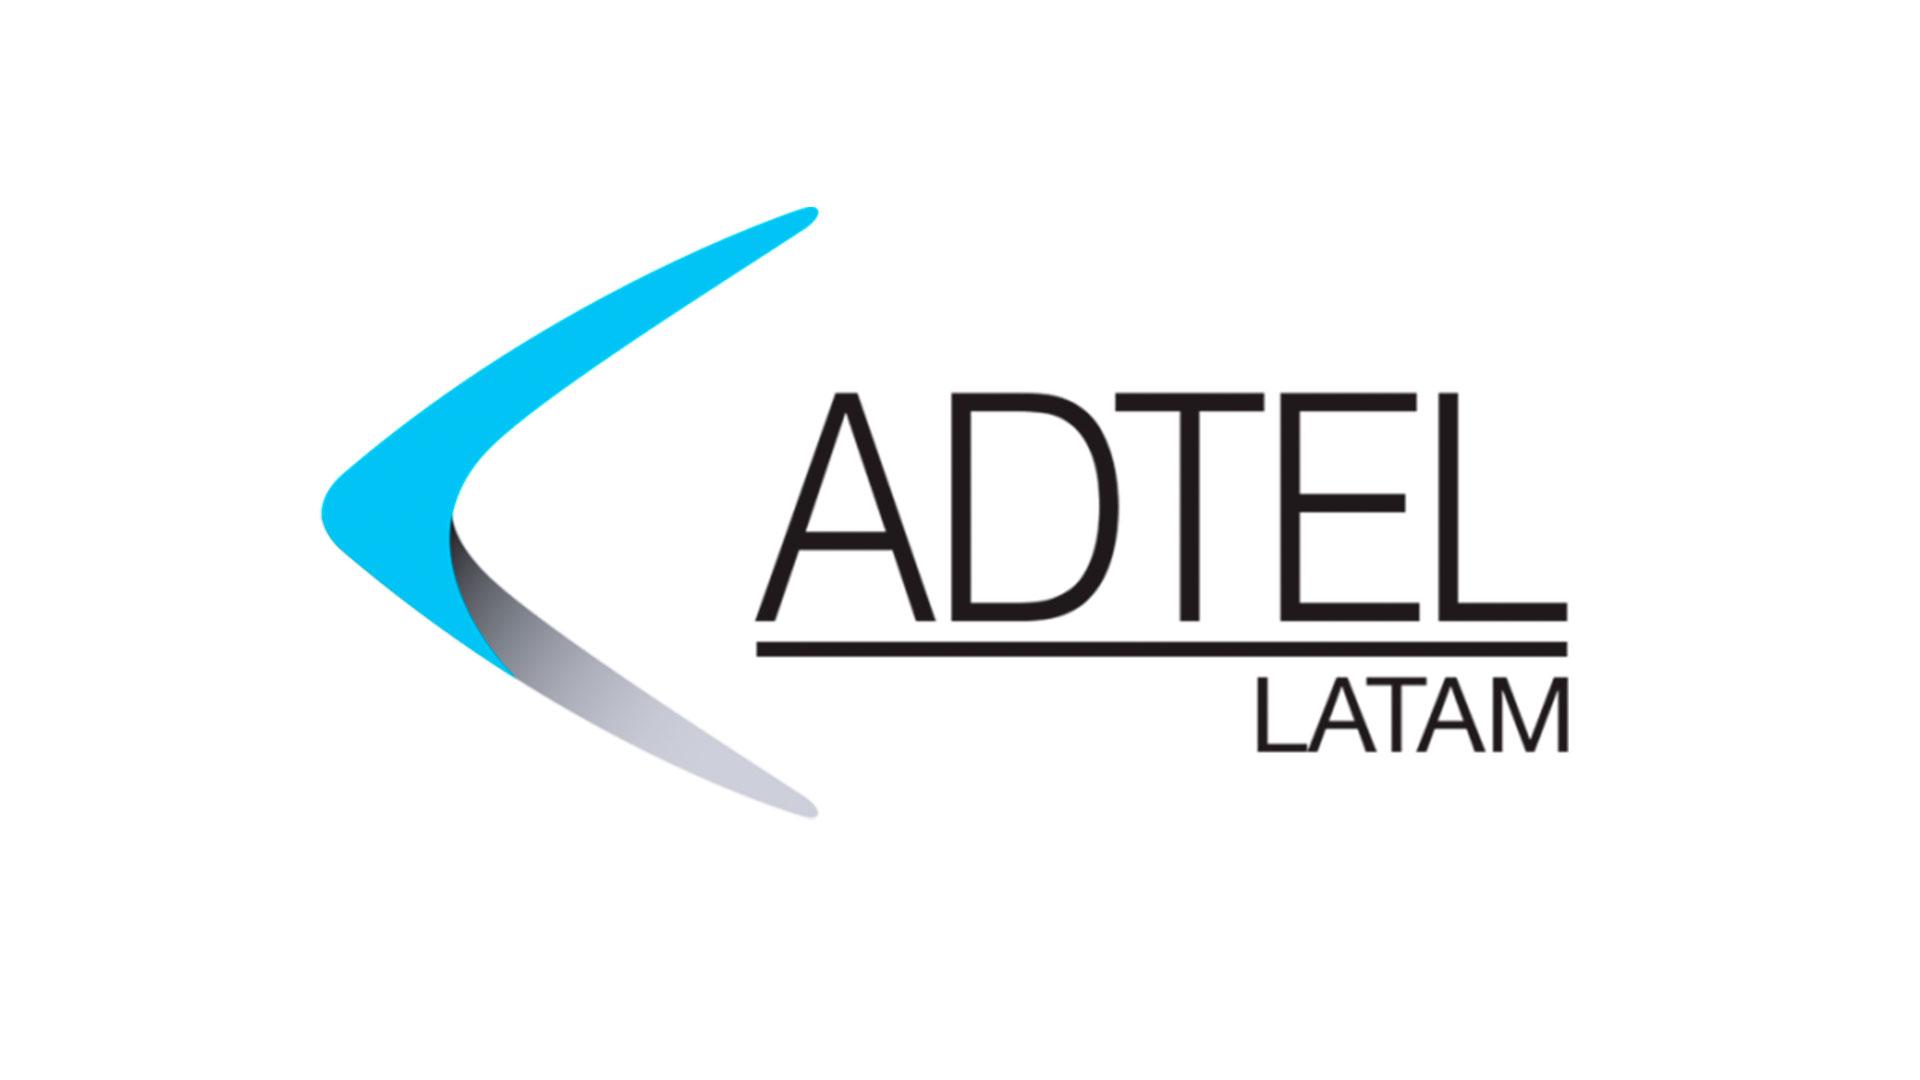 Logo Adtel Latam